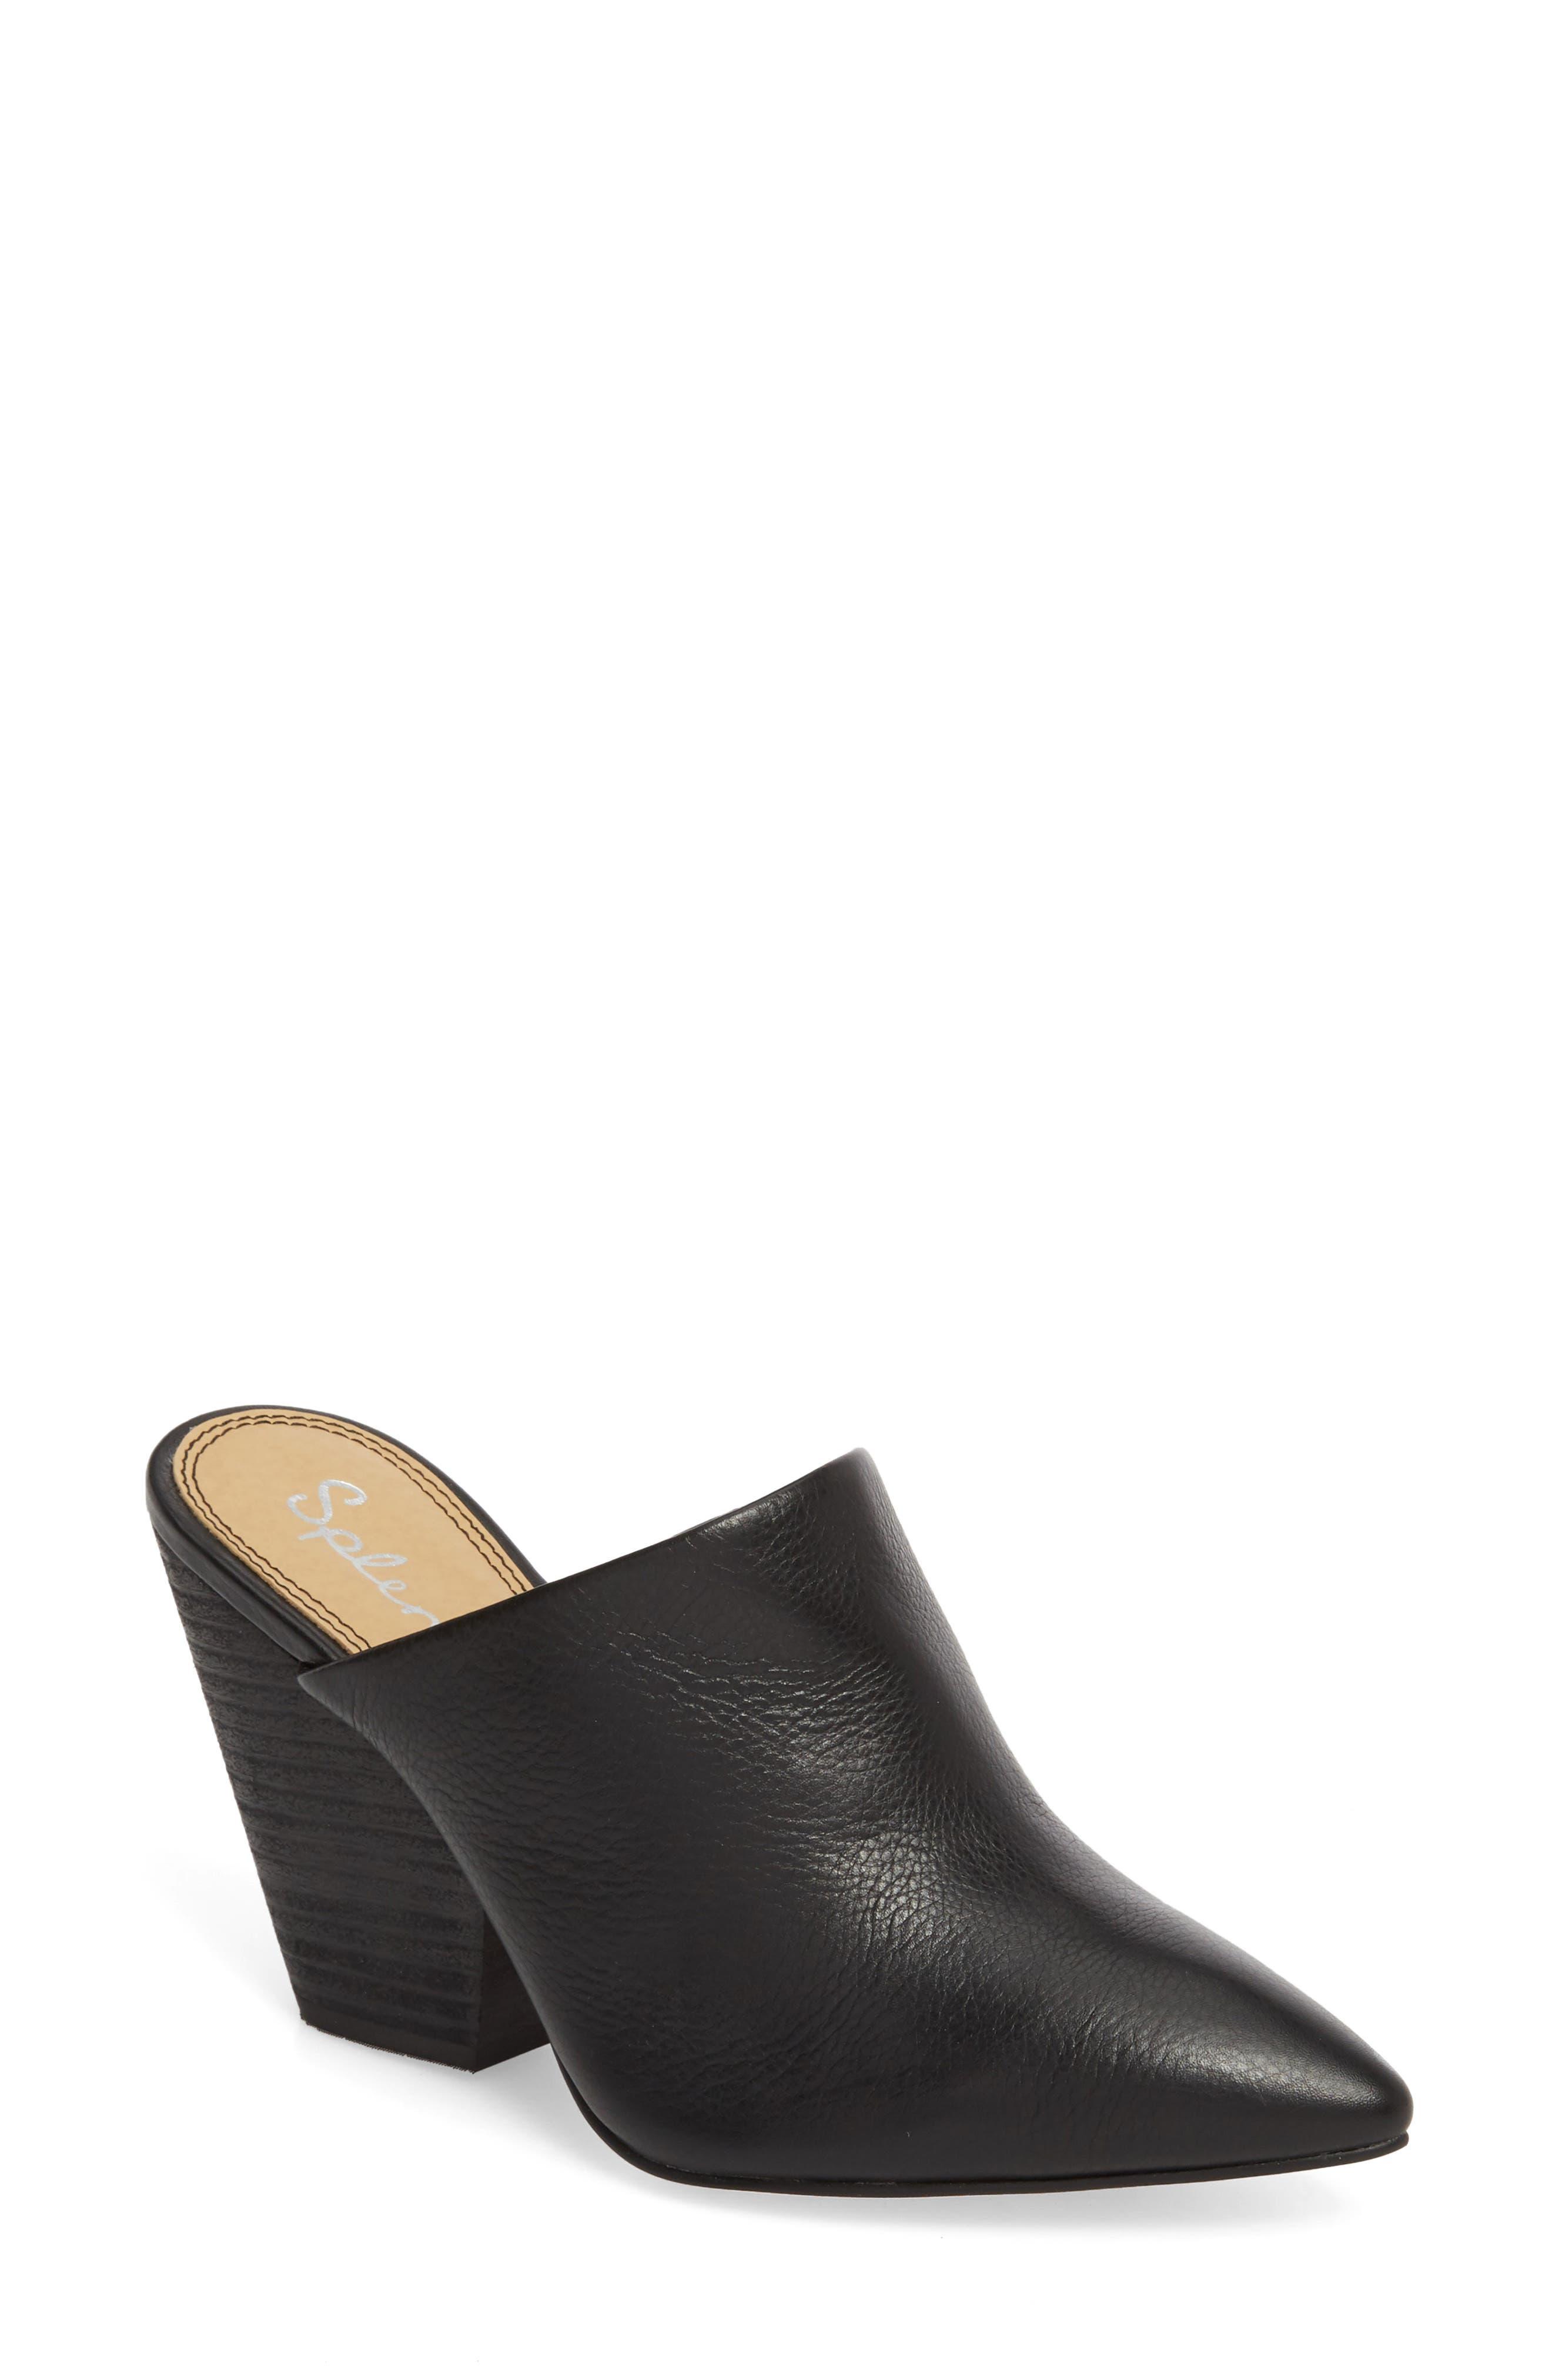 d9d9625299cd Splendid women nala pointed toe leather high heel mules in black jpg  780x838 High heel mules